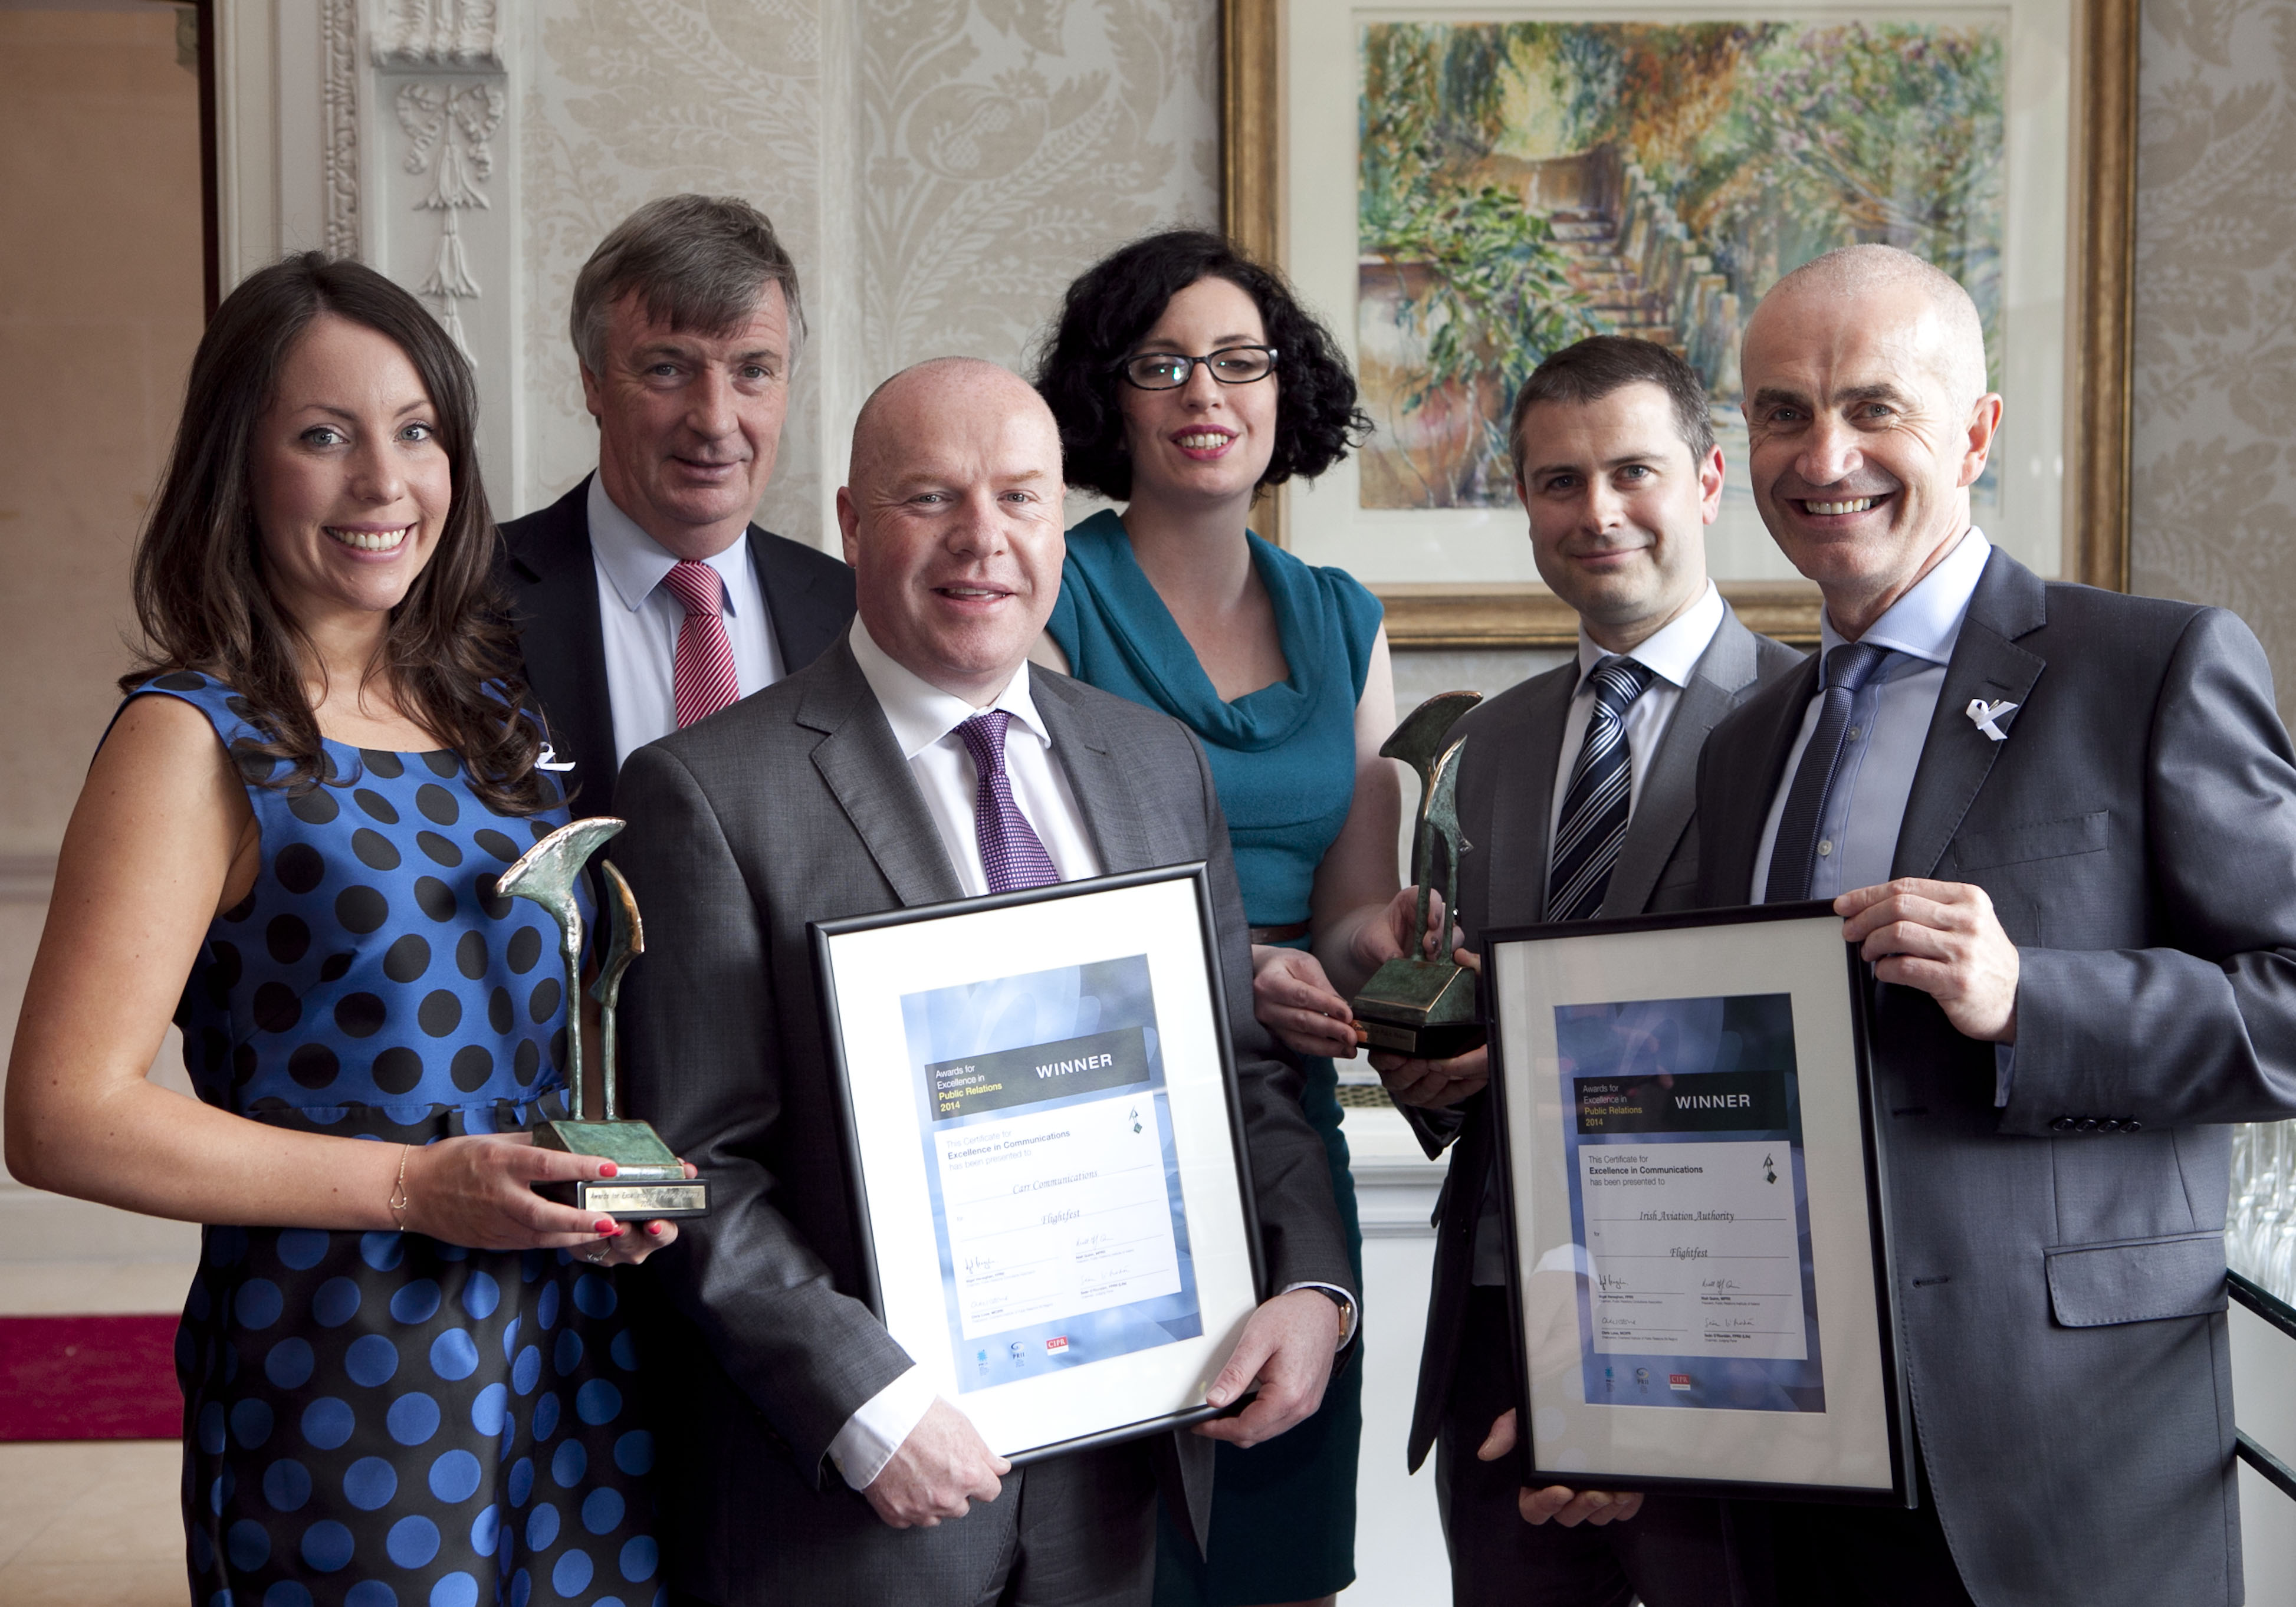 IAA Winner of Best Event for FlightFest at PR in Excellence Award